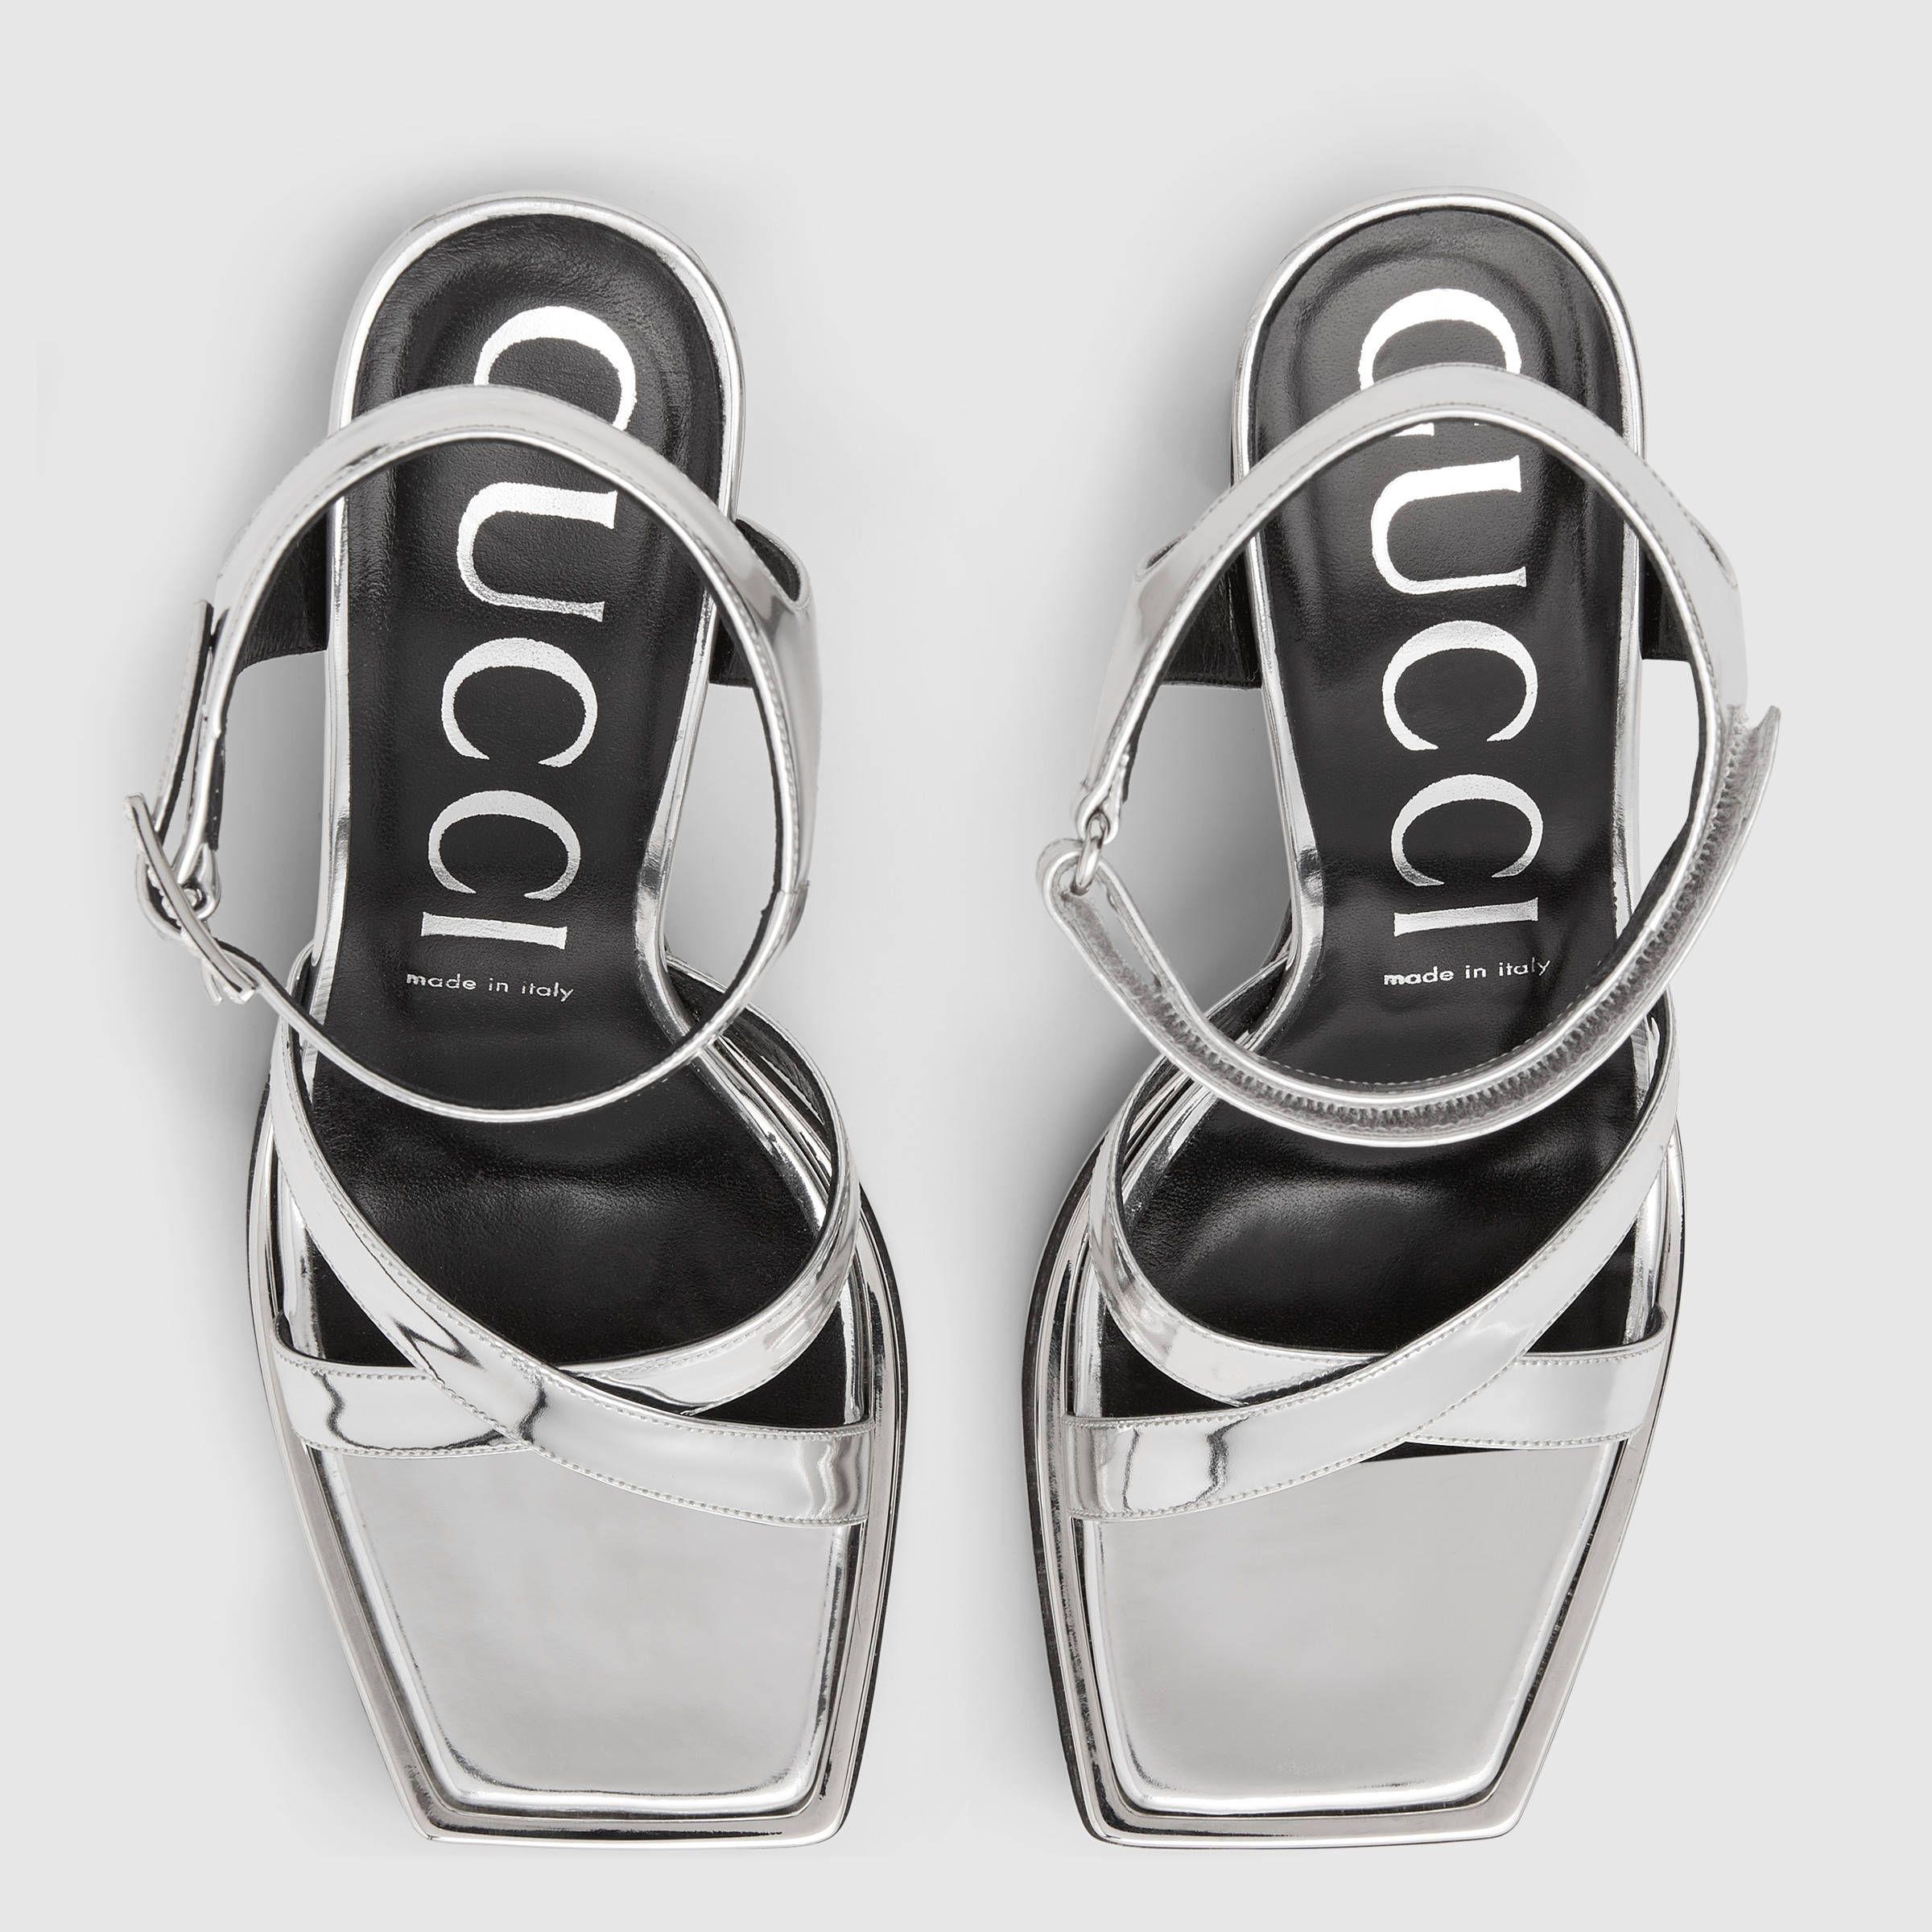 54a662316 Sandalia con Plataforma de Piel Metalizada - Gucci Sandalias Planas  513714BRK008106